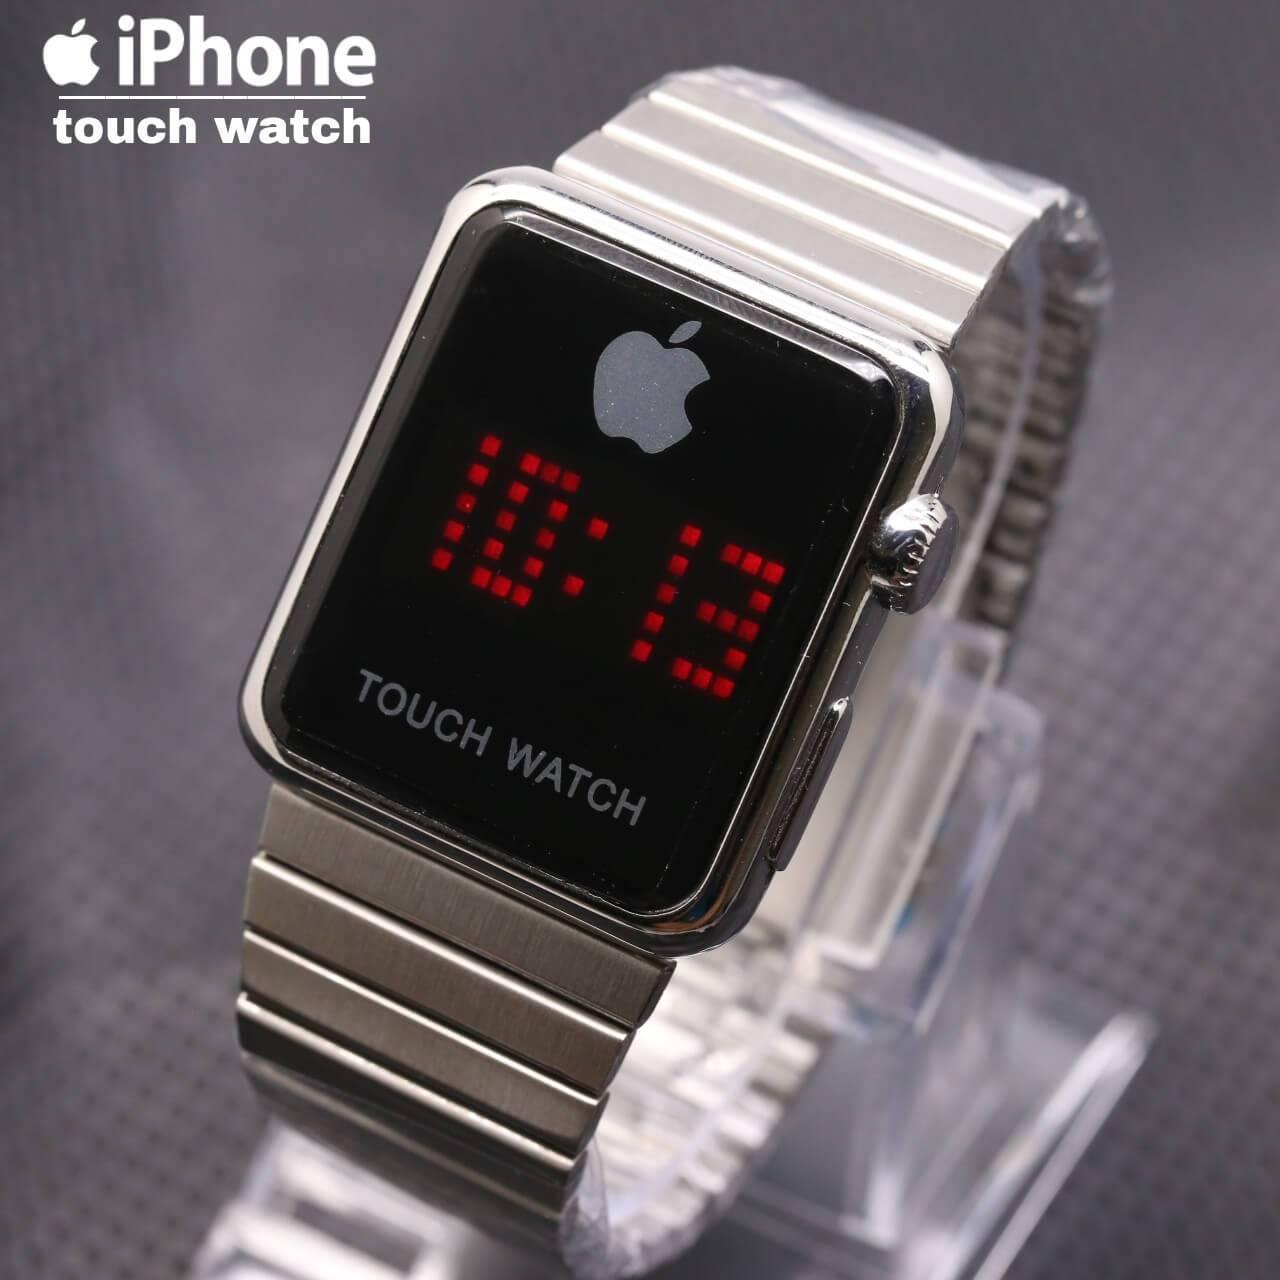 Fitur Jam Tangan Touch Screen Eiger Dan Harga Terbaru Daftar Iphone Pria Smart Watch Stainless Steel Limited Edition